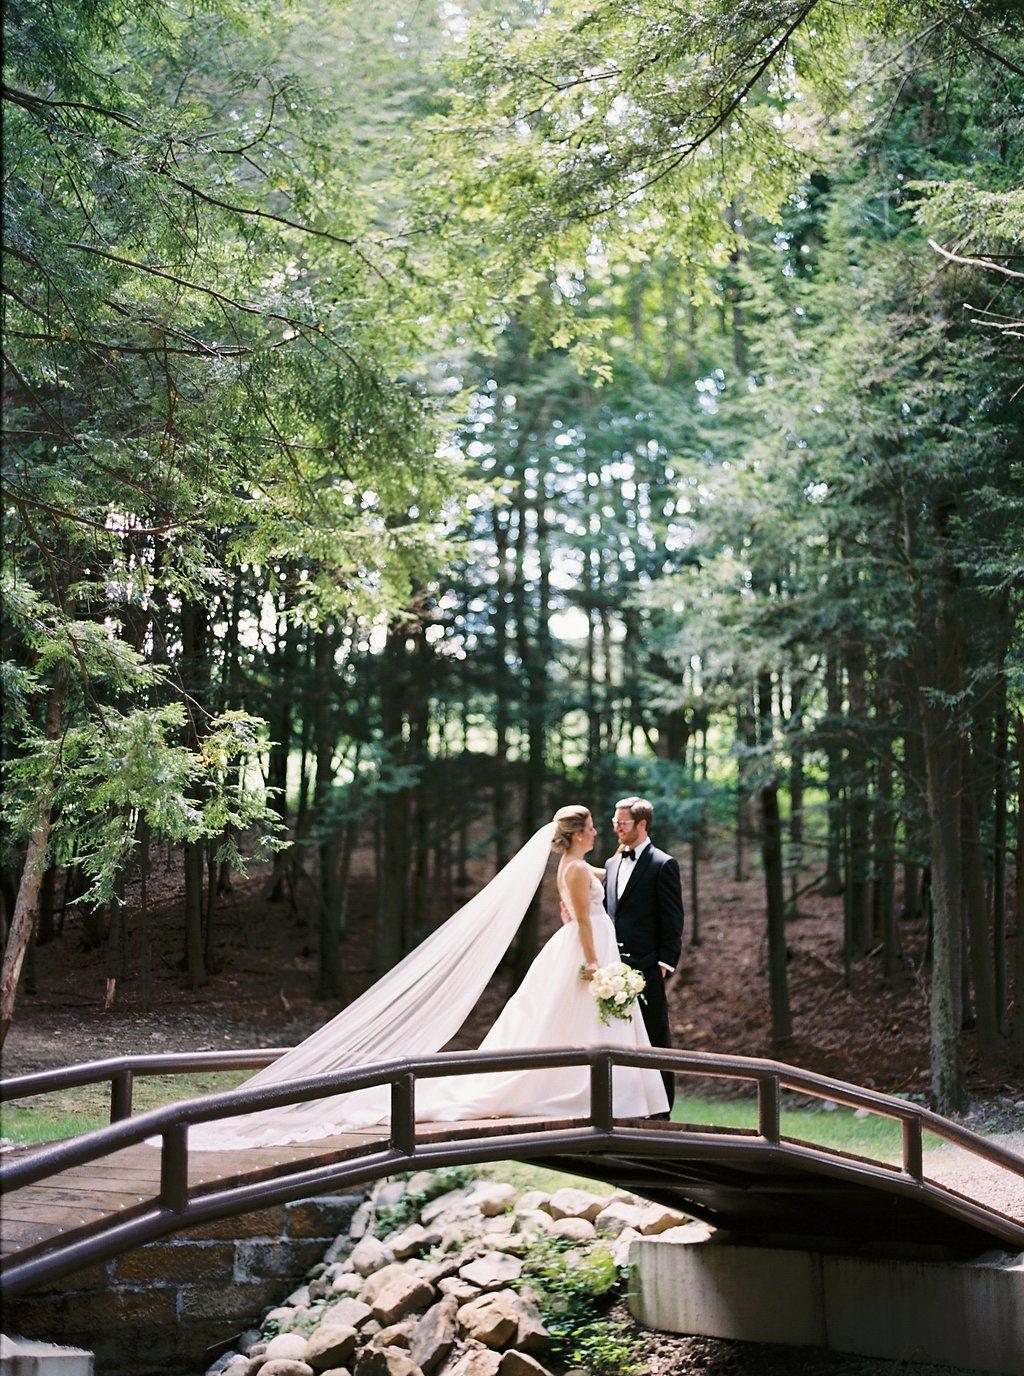 Chic Upstateny Orchard Wedding 02